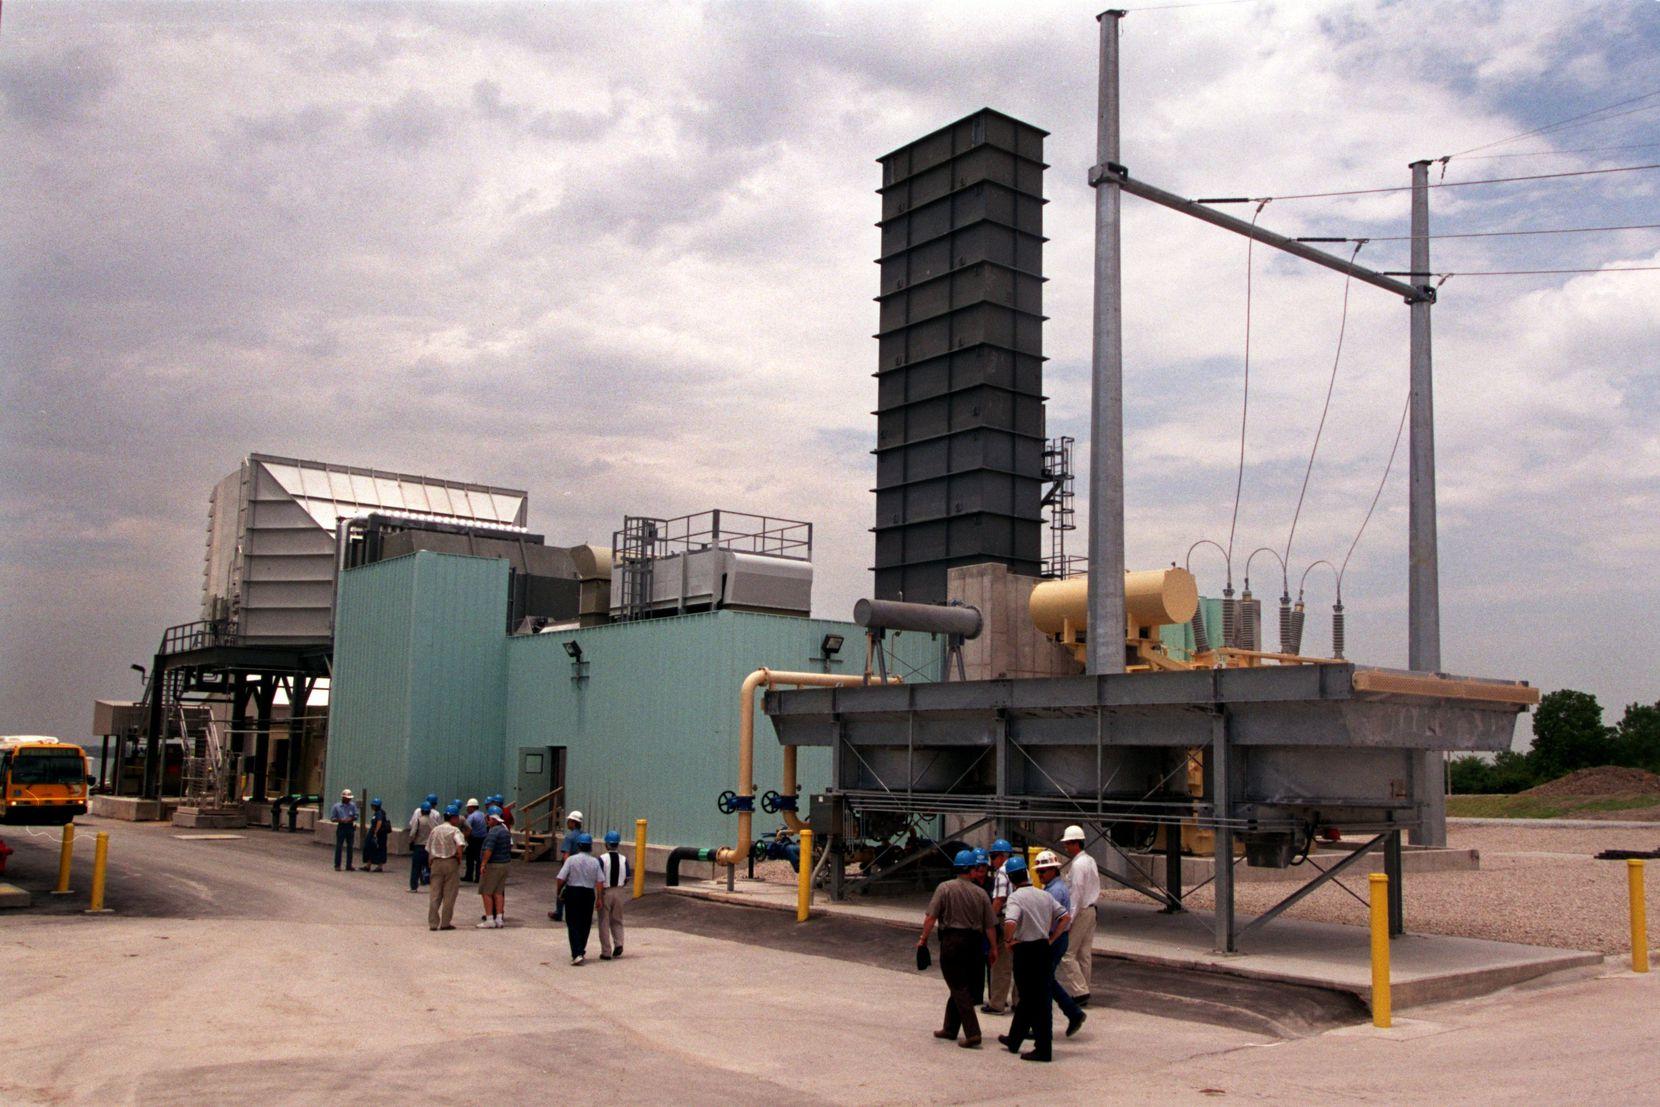 Garland Municipal Power Plant